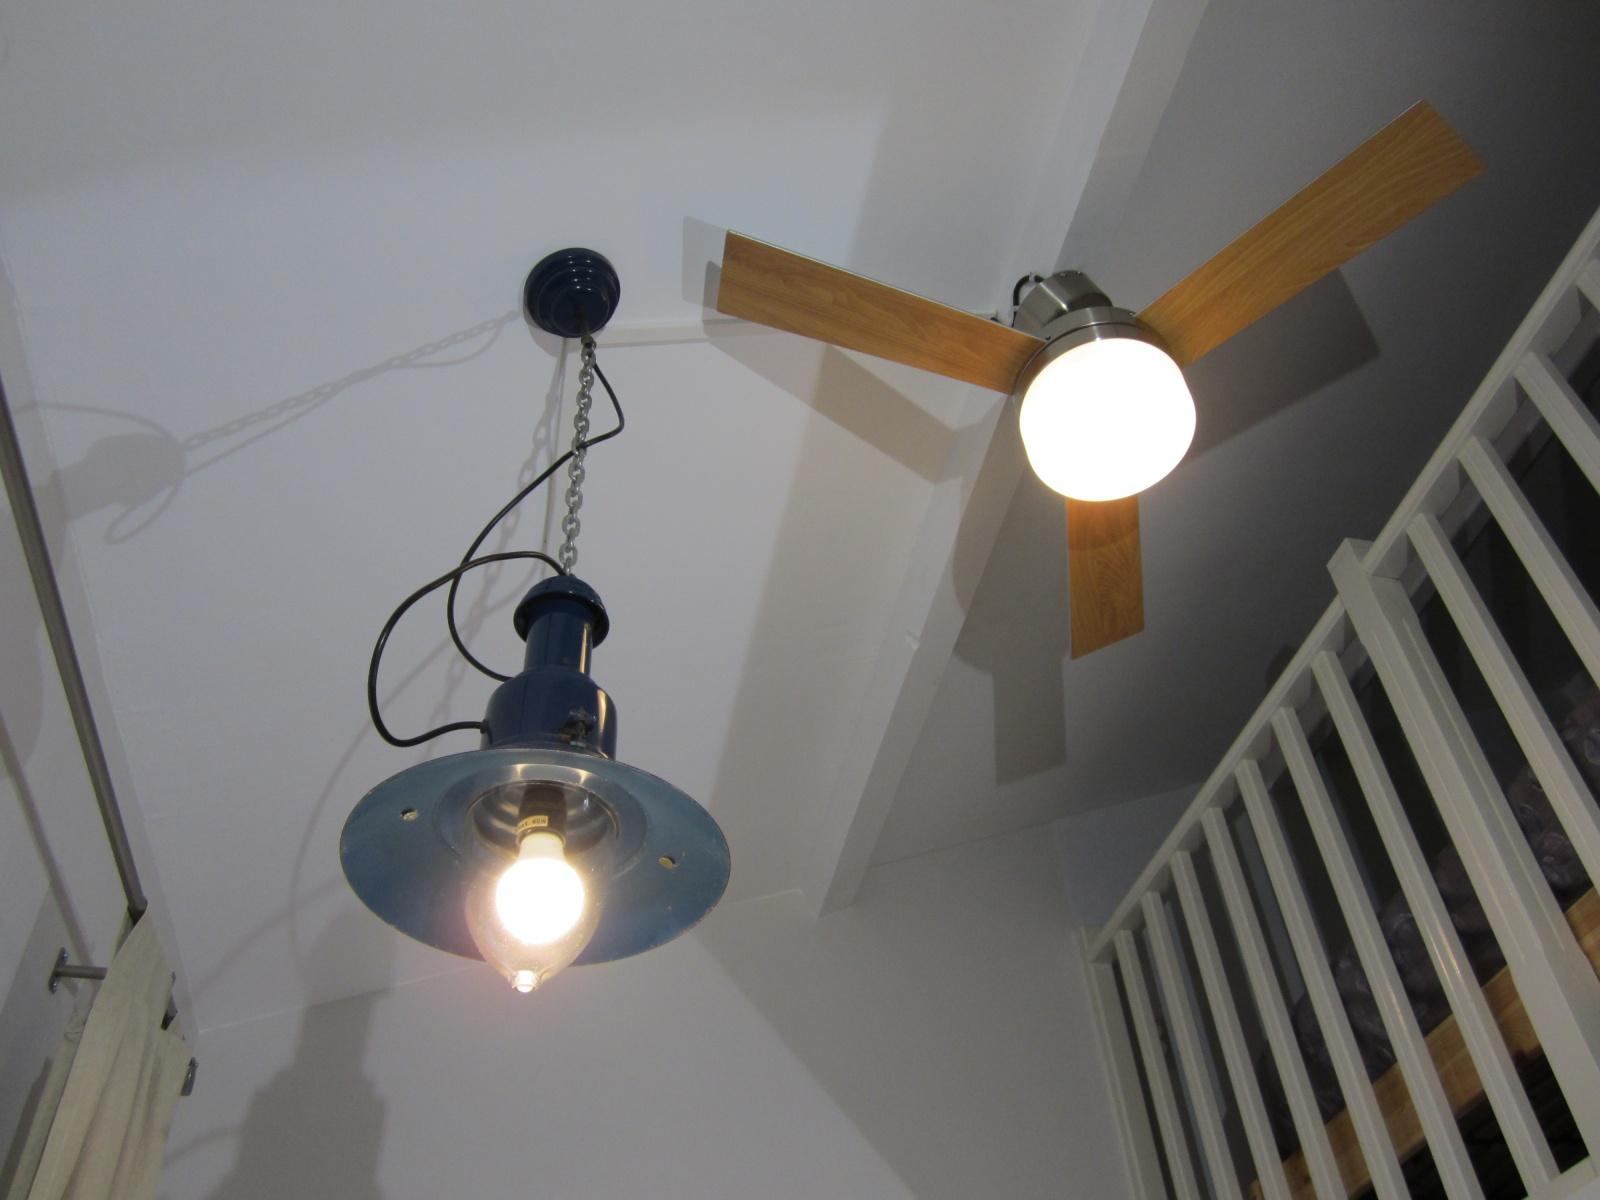 Schipperslamp en geruisloze plafondventilator